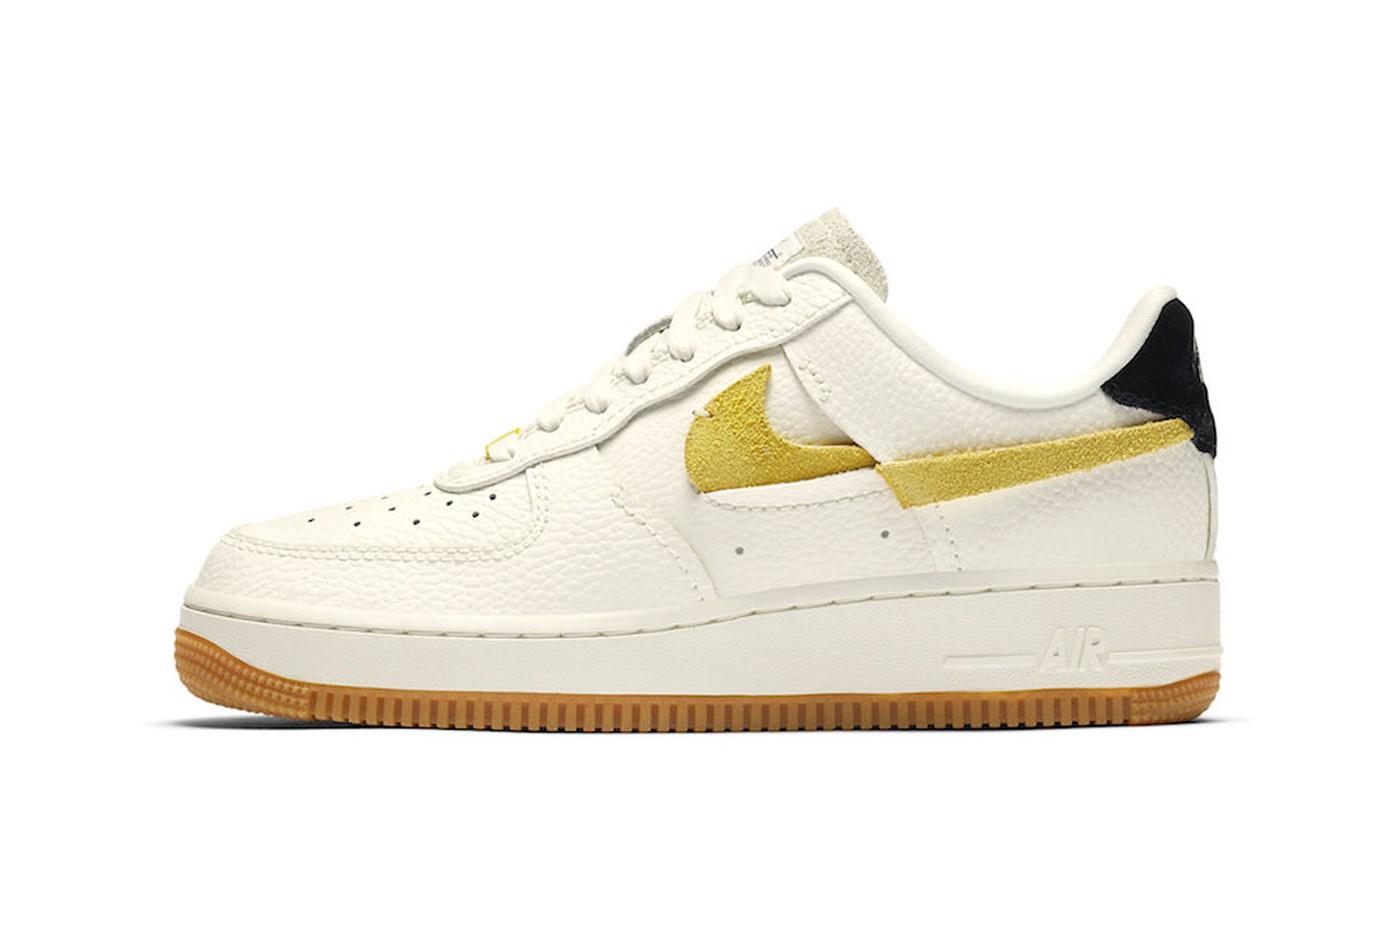 Nike WMNS Air Force 1 '07 LXX Chrome Yellow